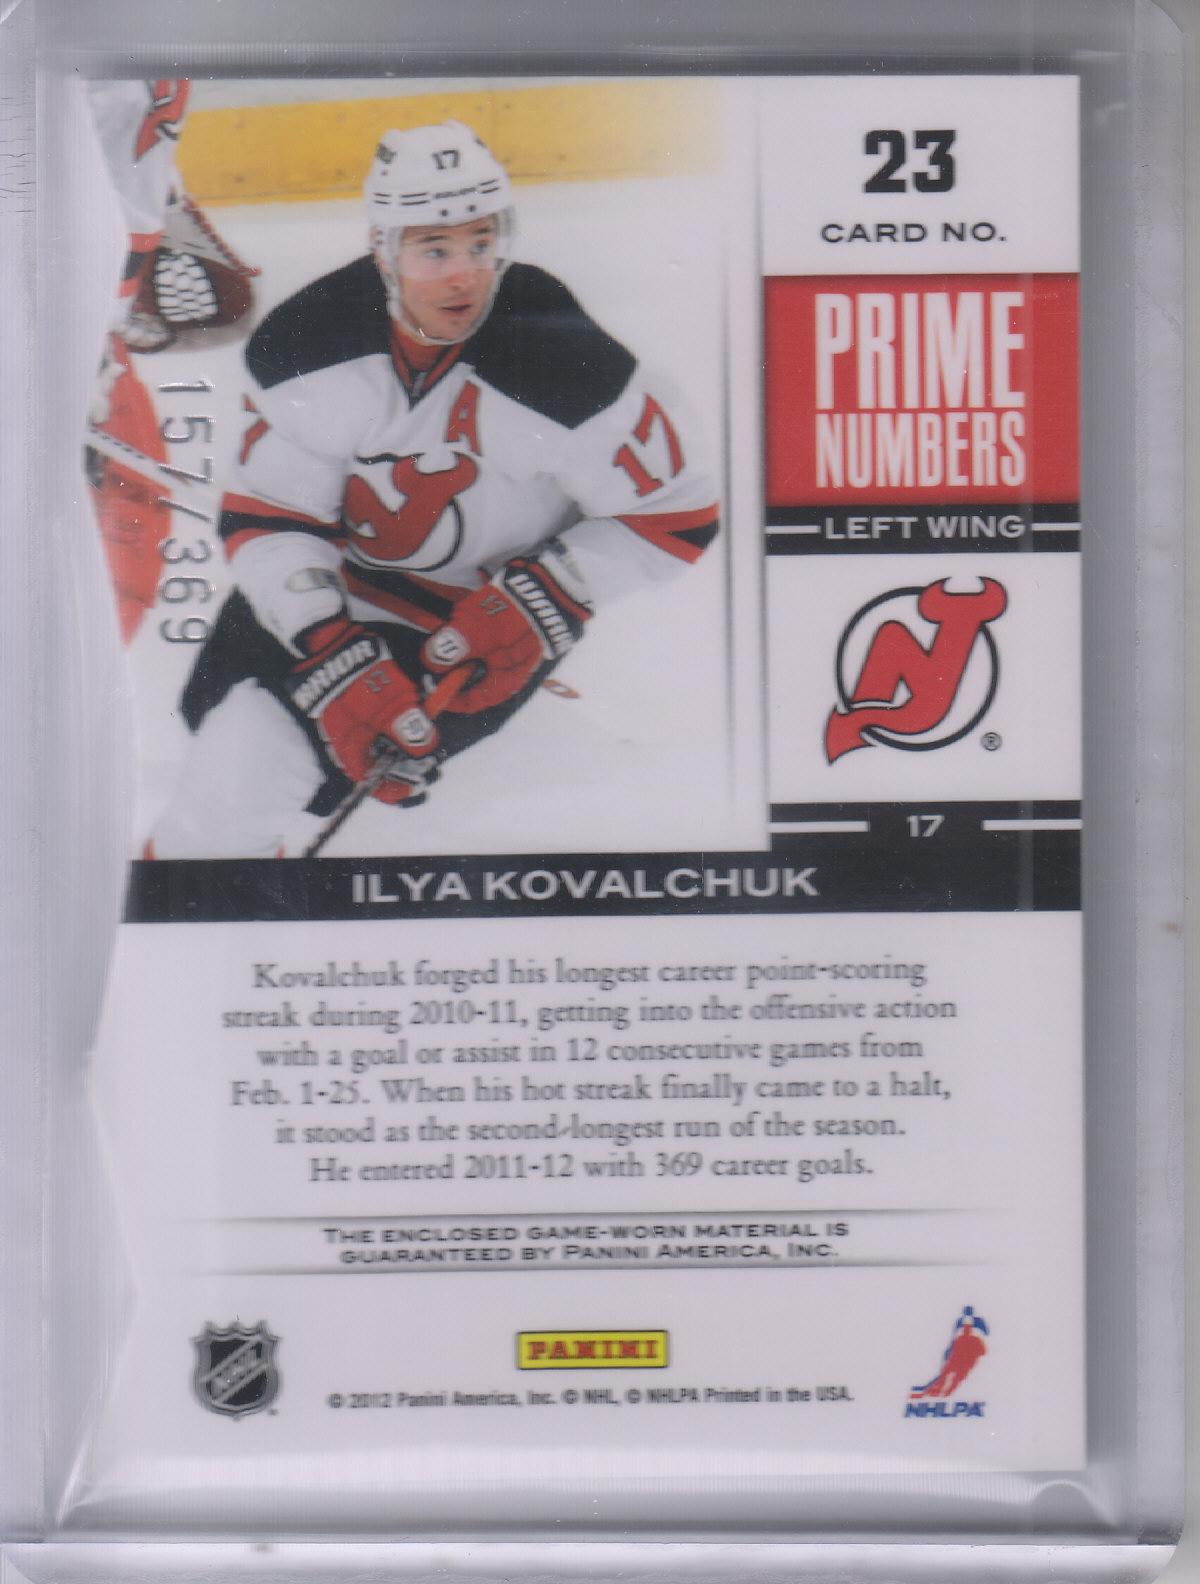 2011-12 Elite Prime Number Jerseys #23 Ilya Kovalchuk/300* back image